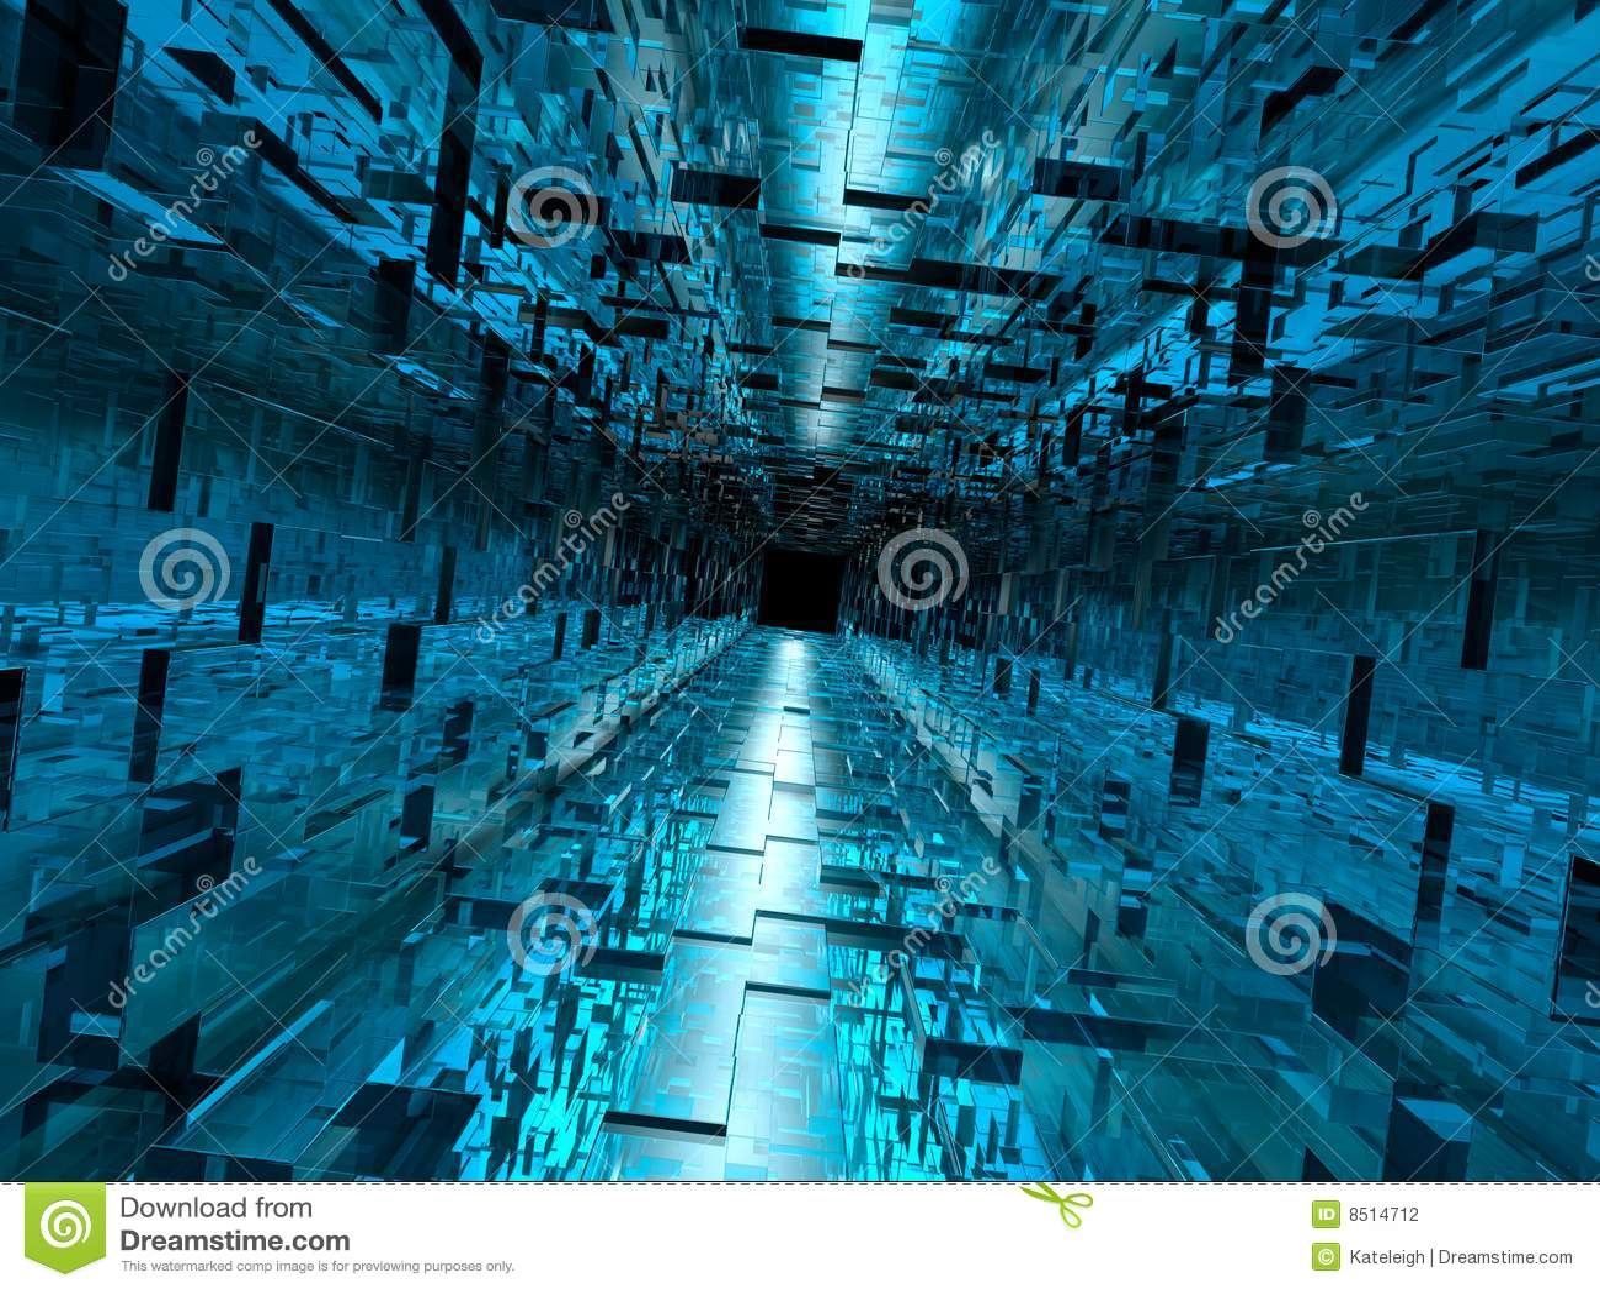 Download Wallpaper Hp 3d High Tech Hallway Stock Illustration Image Of Pattern